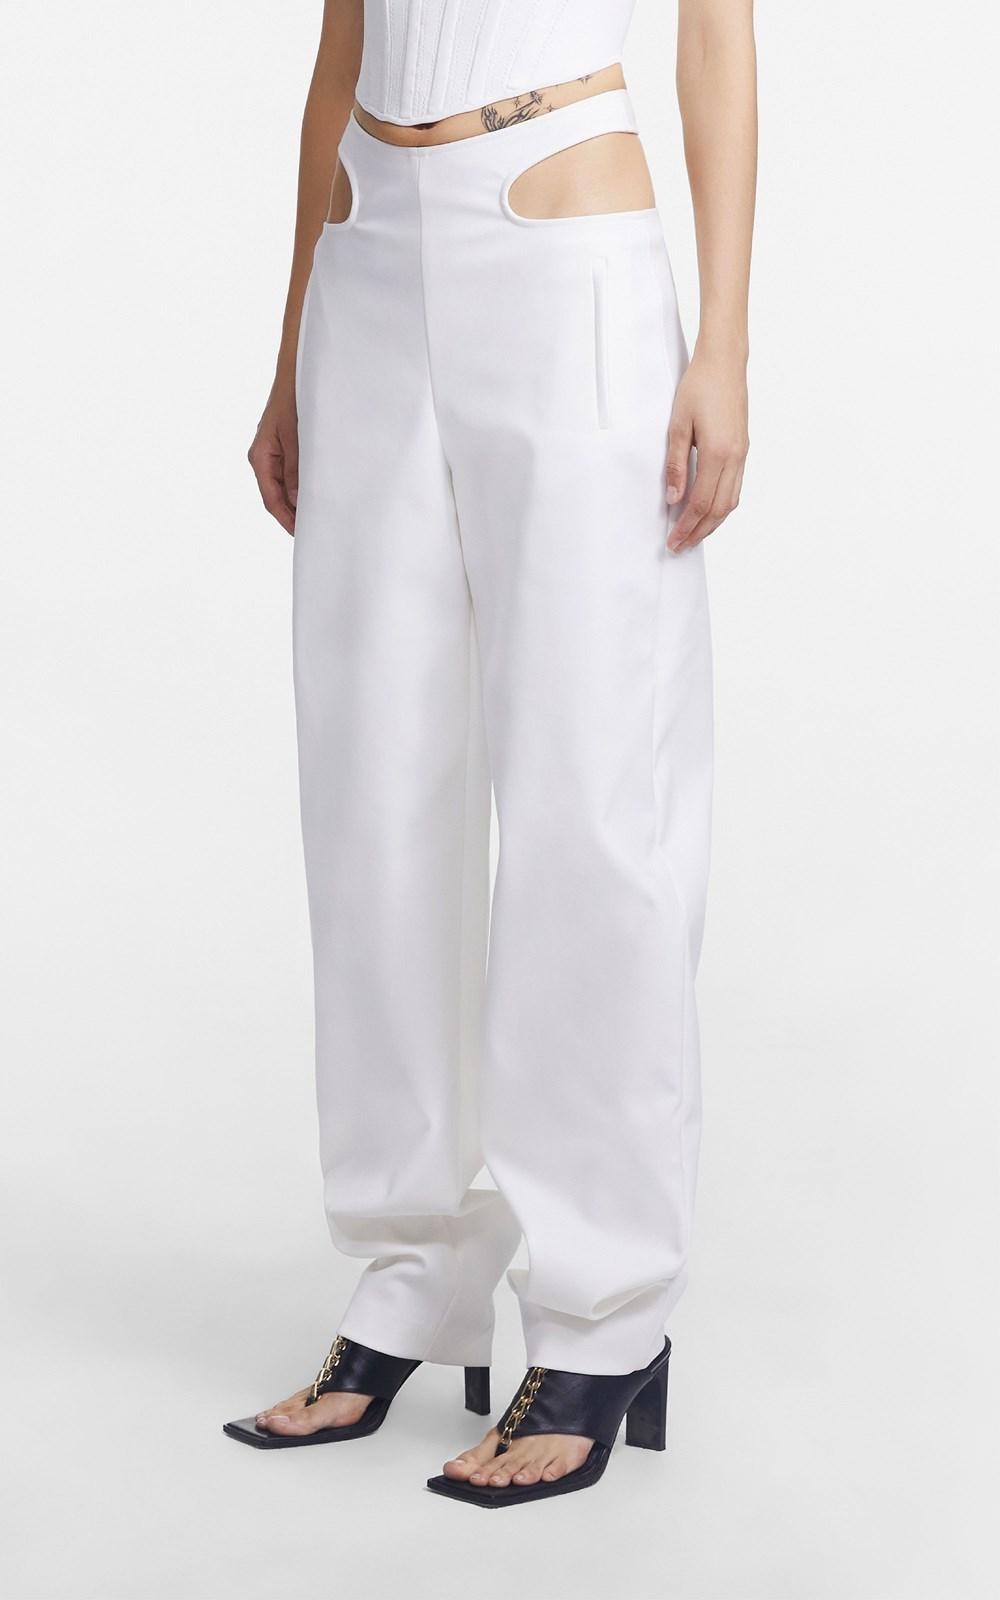 Pants | Y FRONT TIE PANT